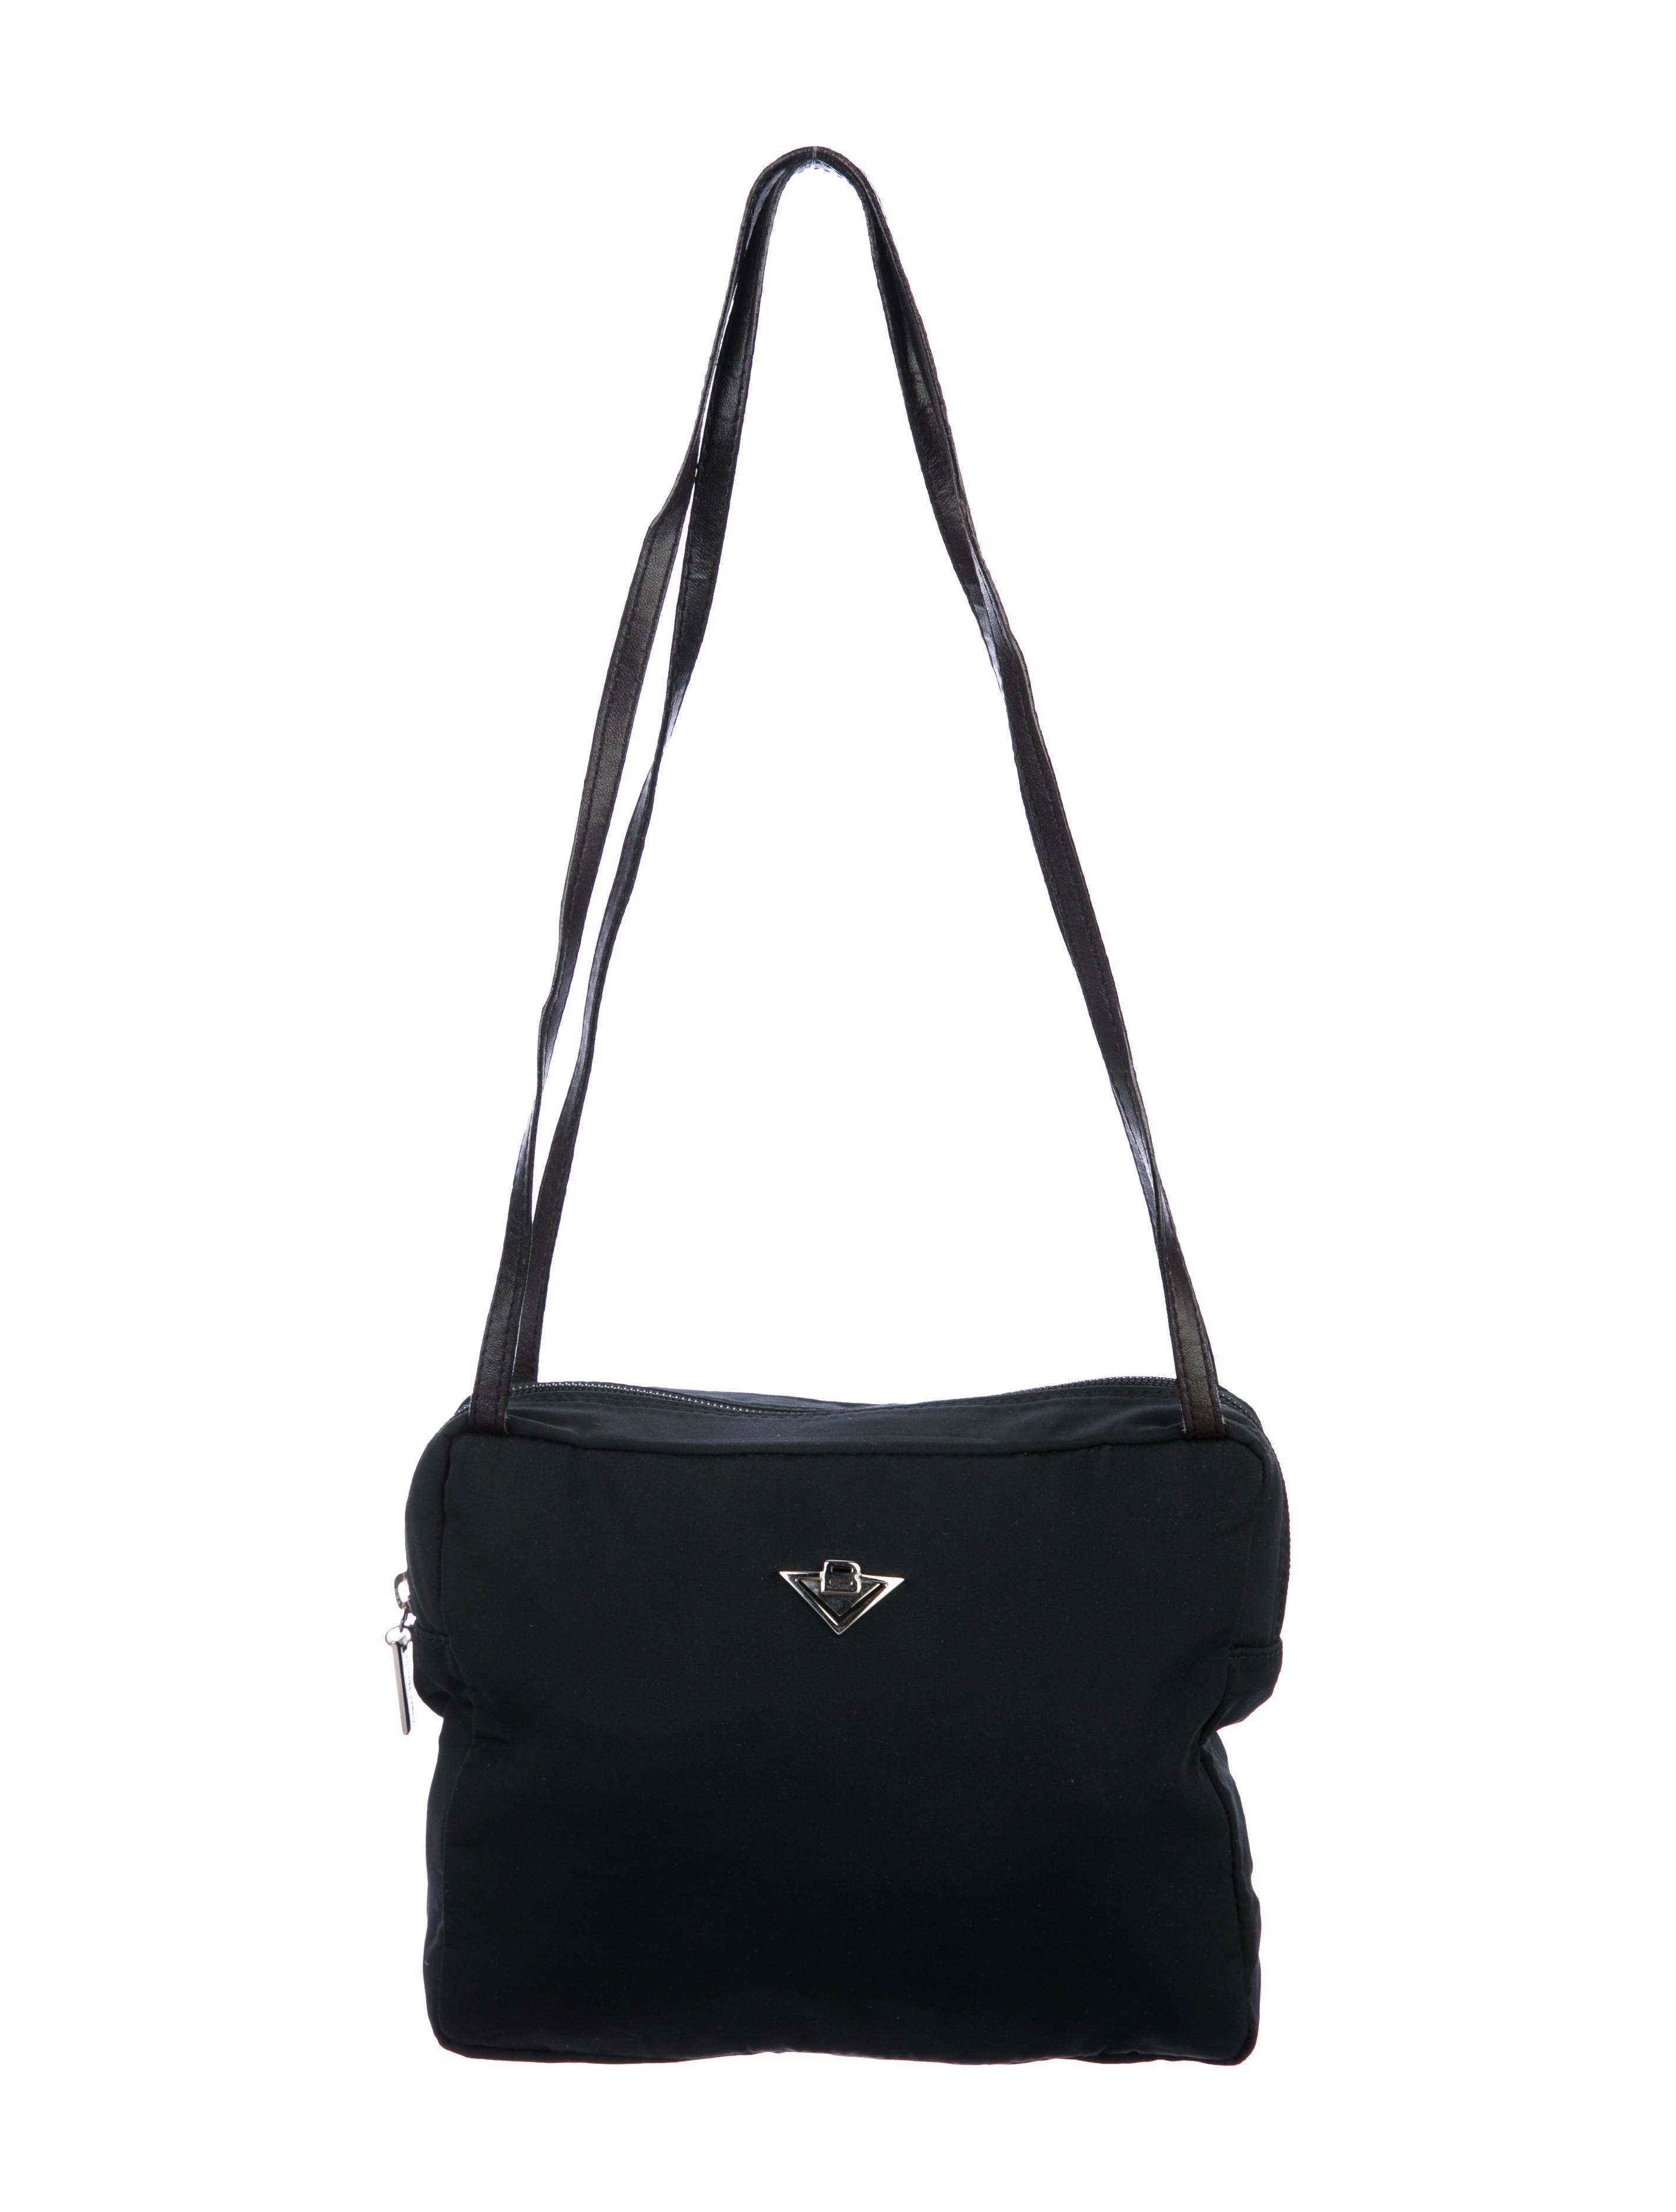 83d95a4352e Bottega Veneta Bag Shoulder Trimmed Leather qqX60wgB for livestock ...